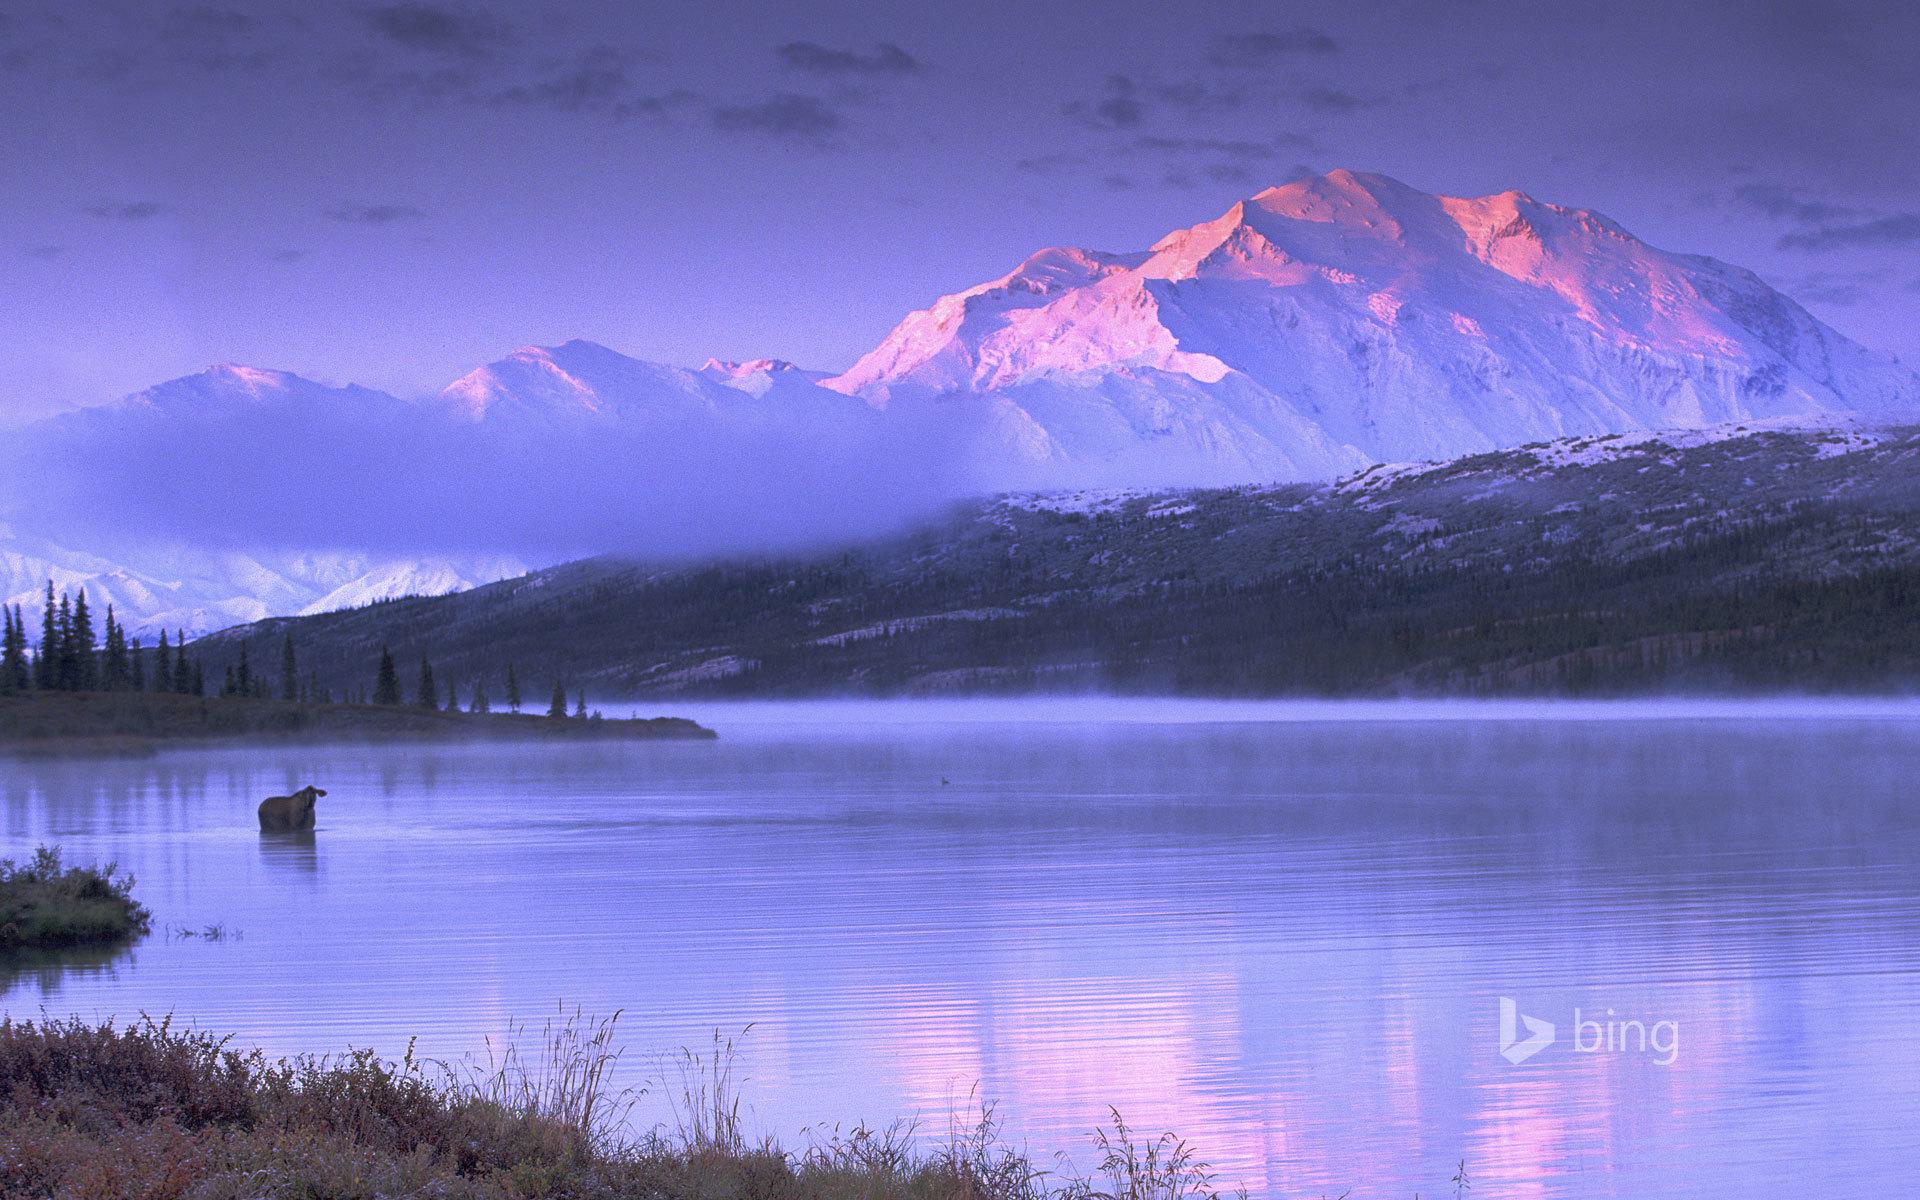 Alsek River Valley, Alaska  № 2454898 загрузить